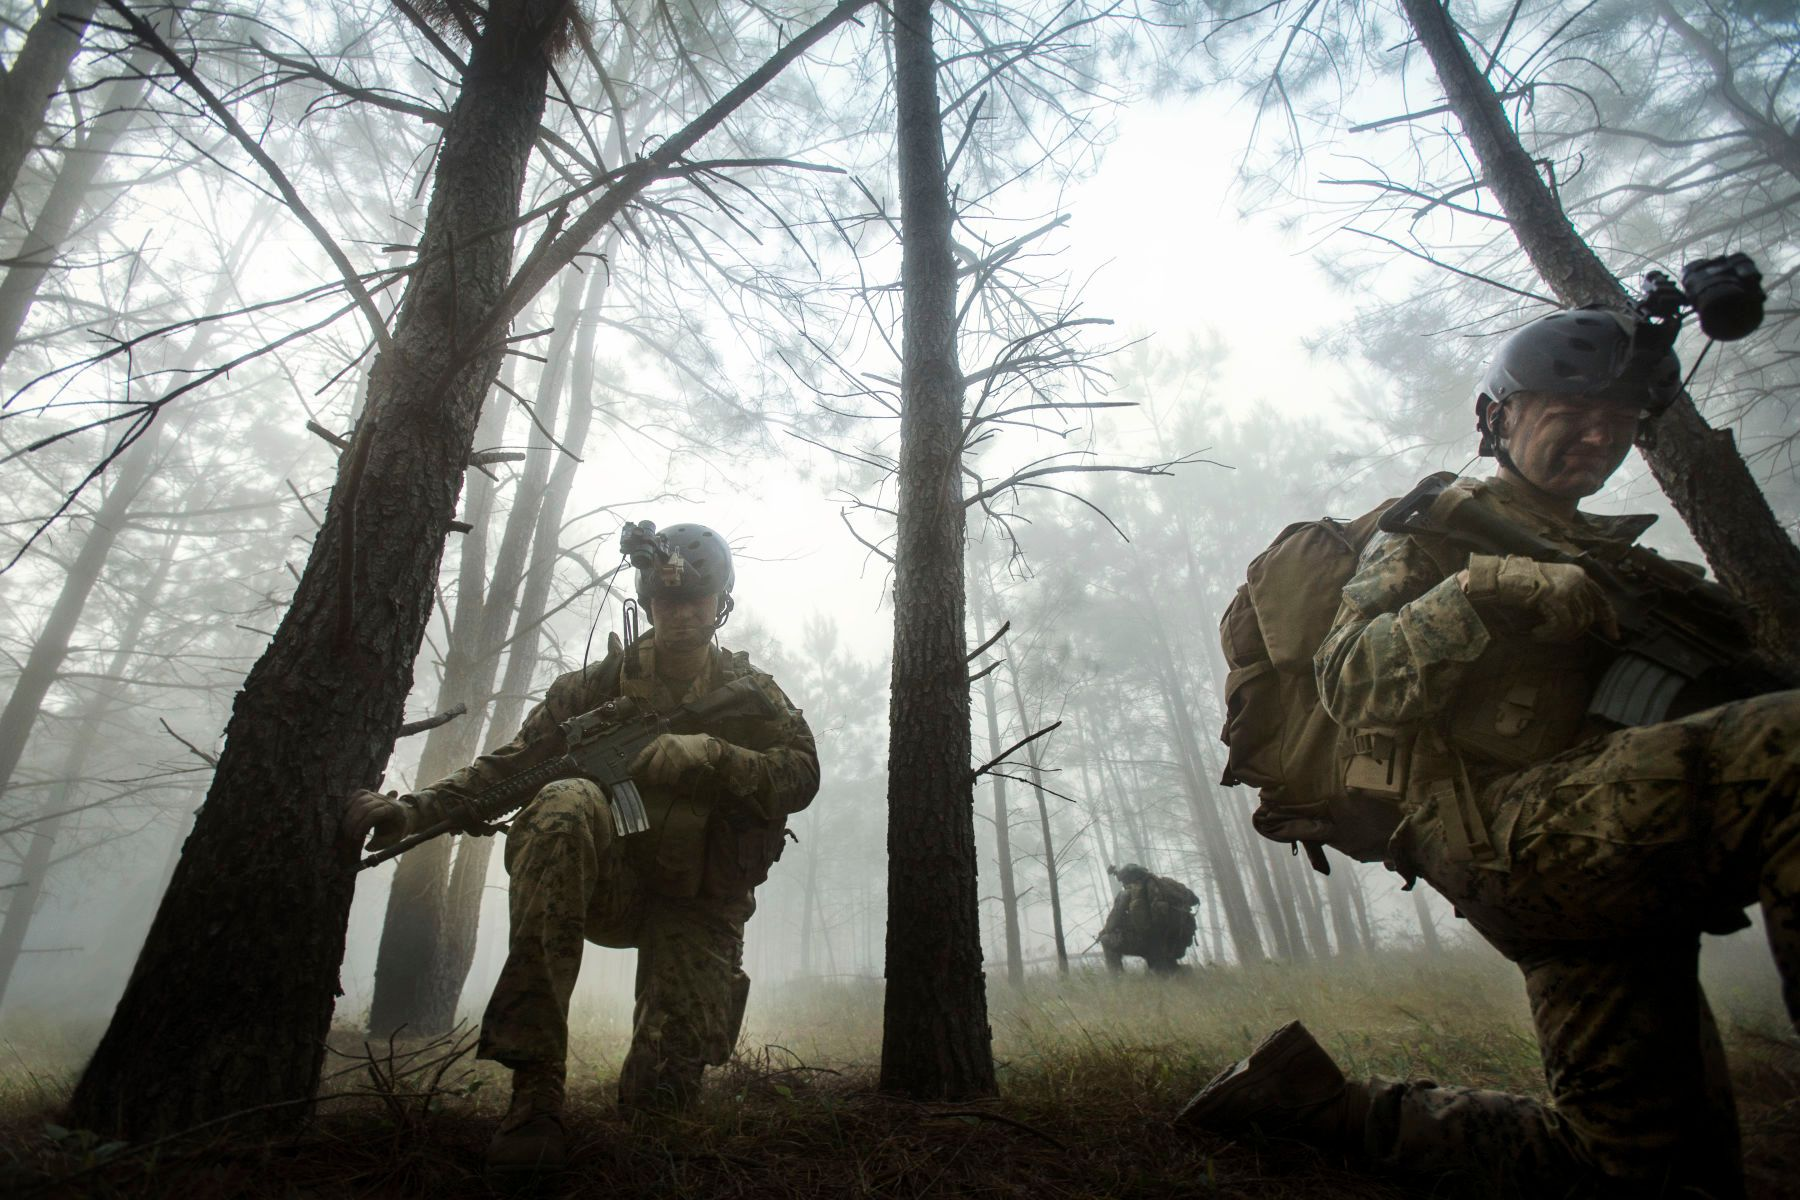 United States Marine Corps | Vance Jacobs Photographer